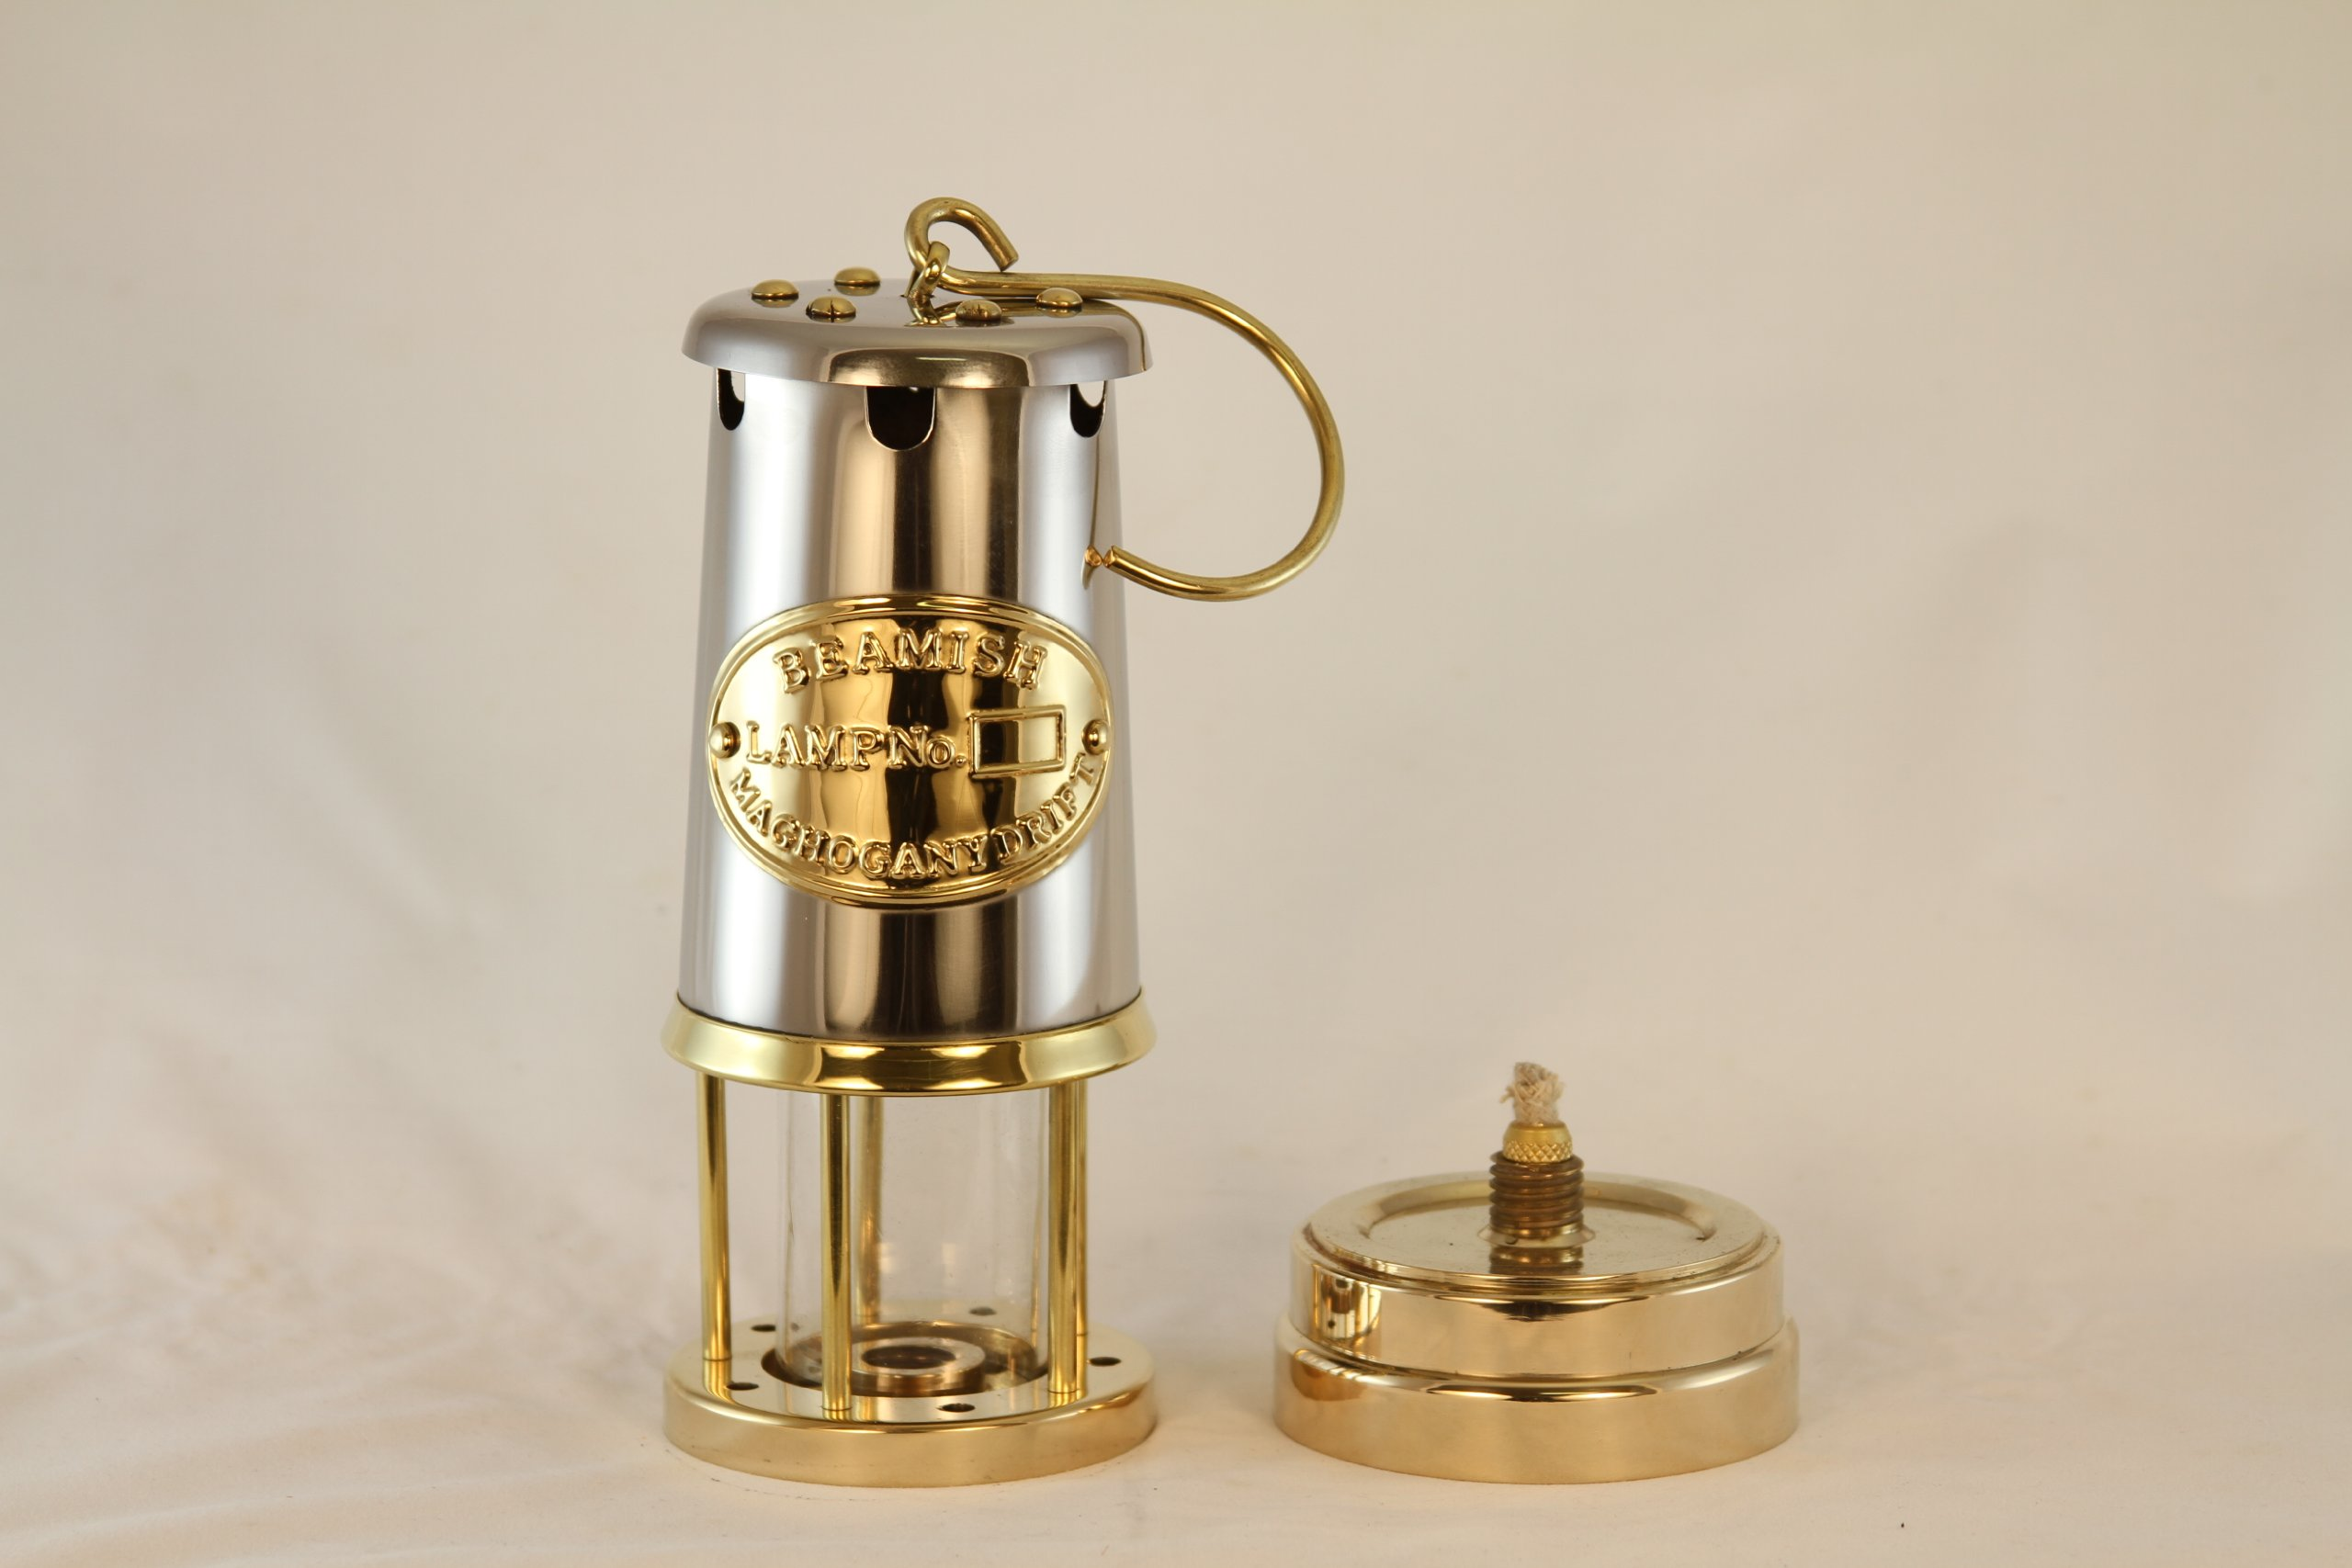 Miners Lamp - Brass & Stainless Steel Yacht Lantern - 9''